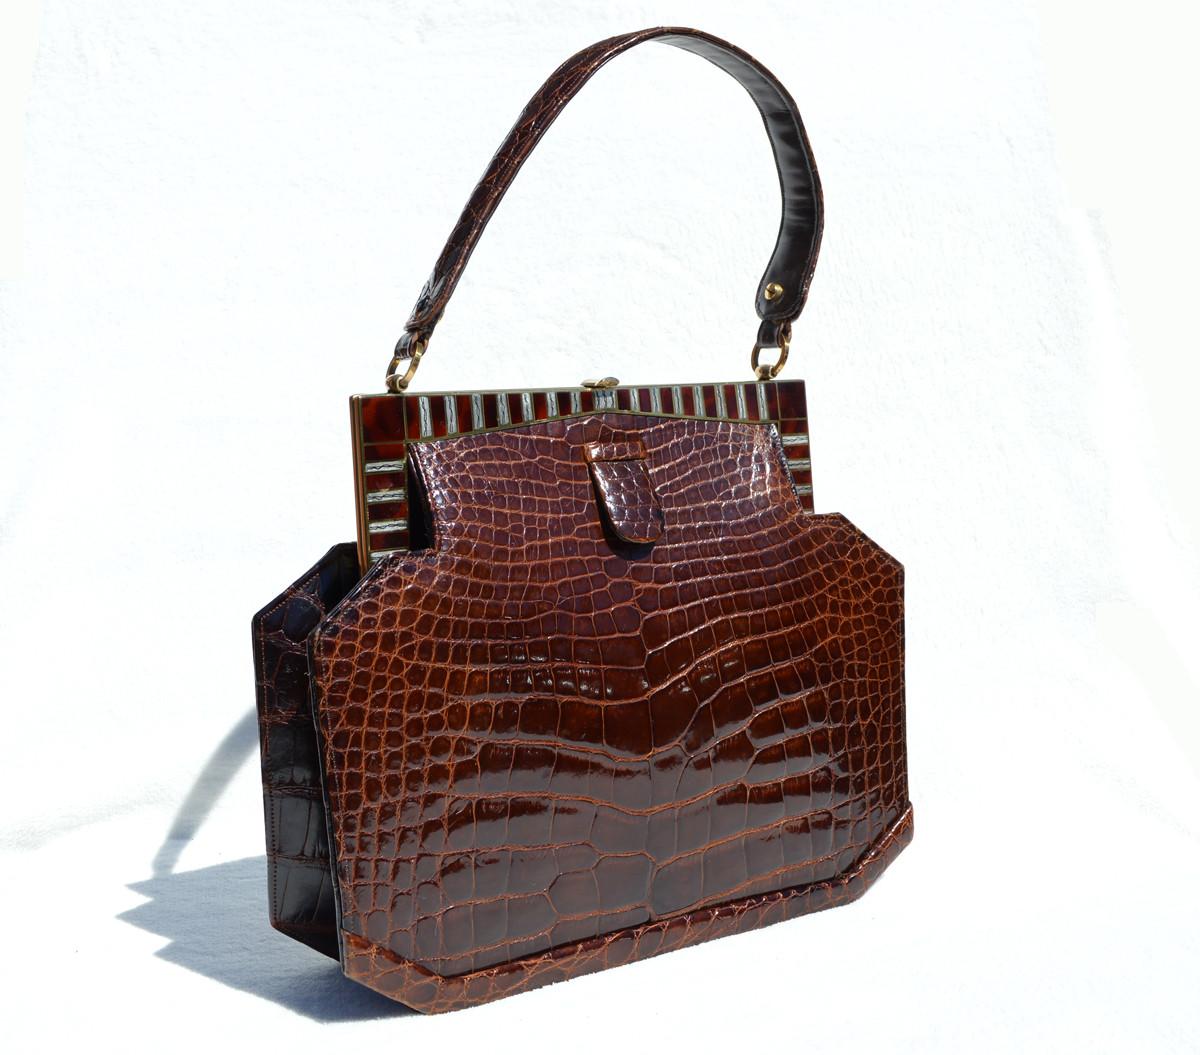 e10337bd89bd Fabulous CHOCOLATE 1950 s-60 s ART DECO Style CROCODILE Skin Handbag ...